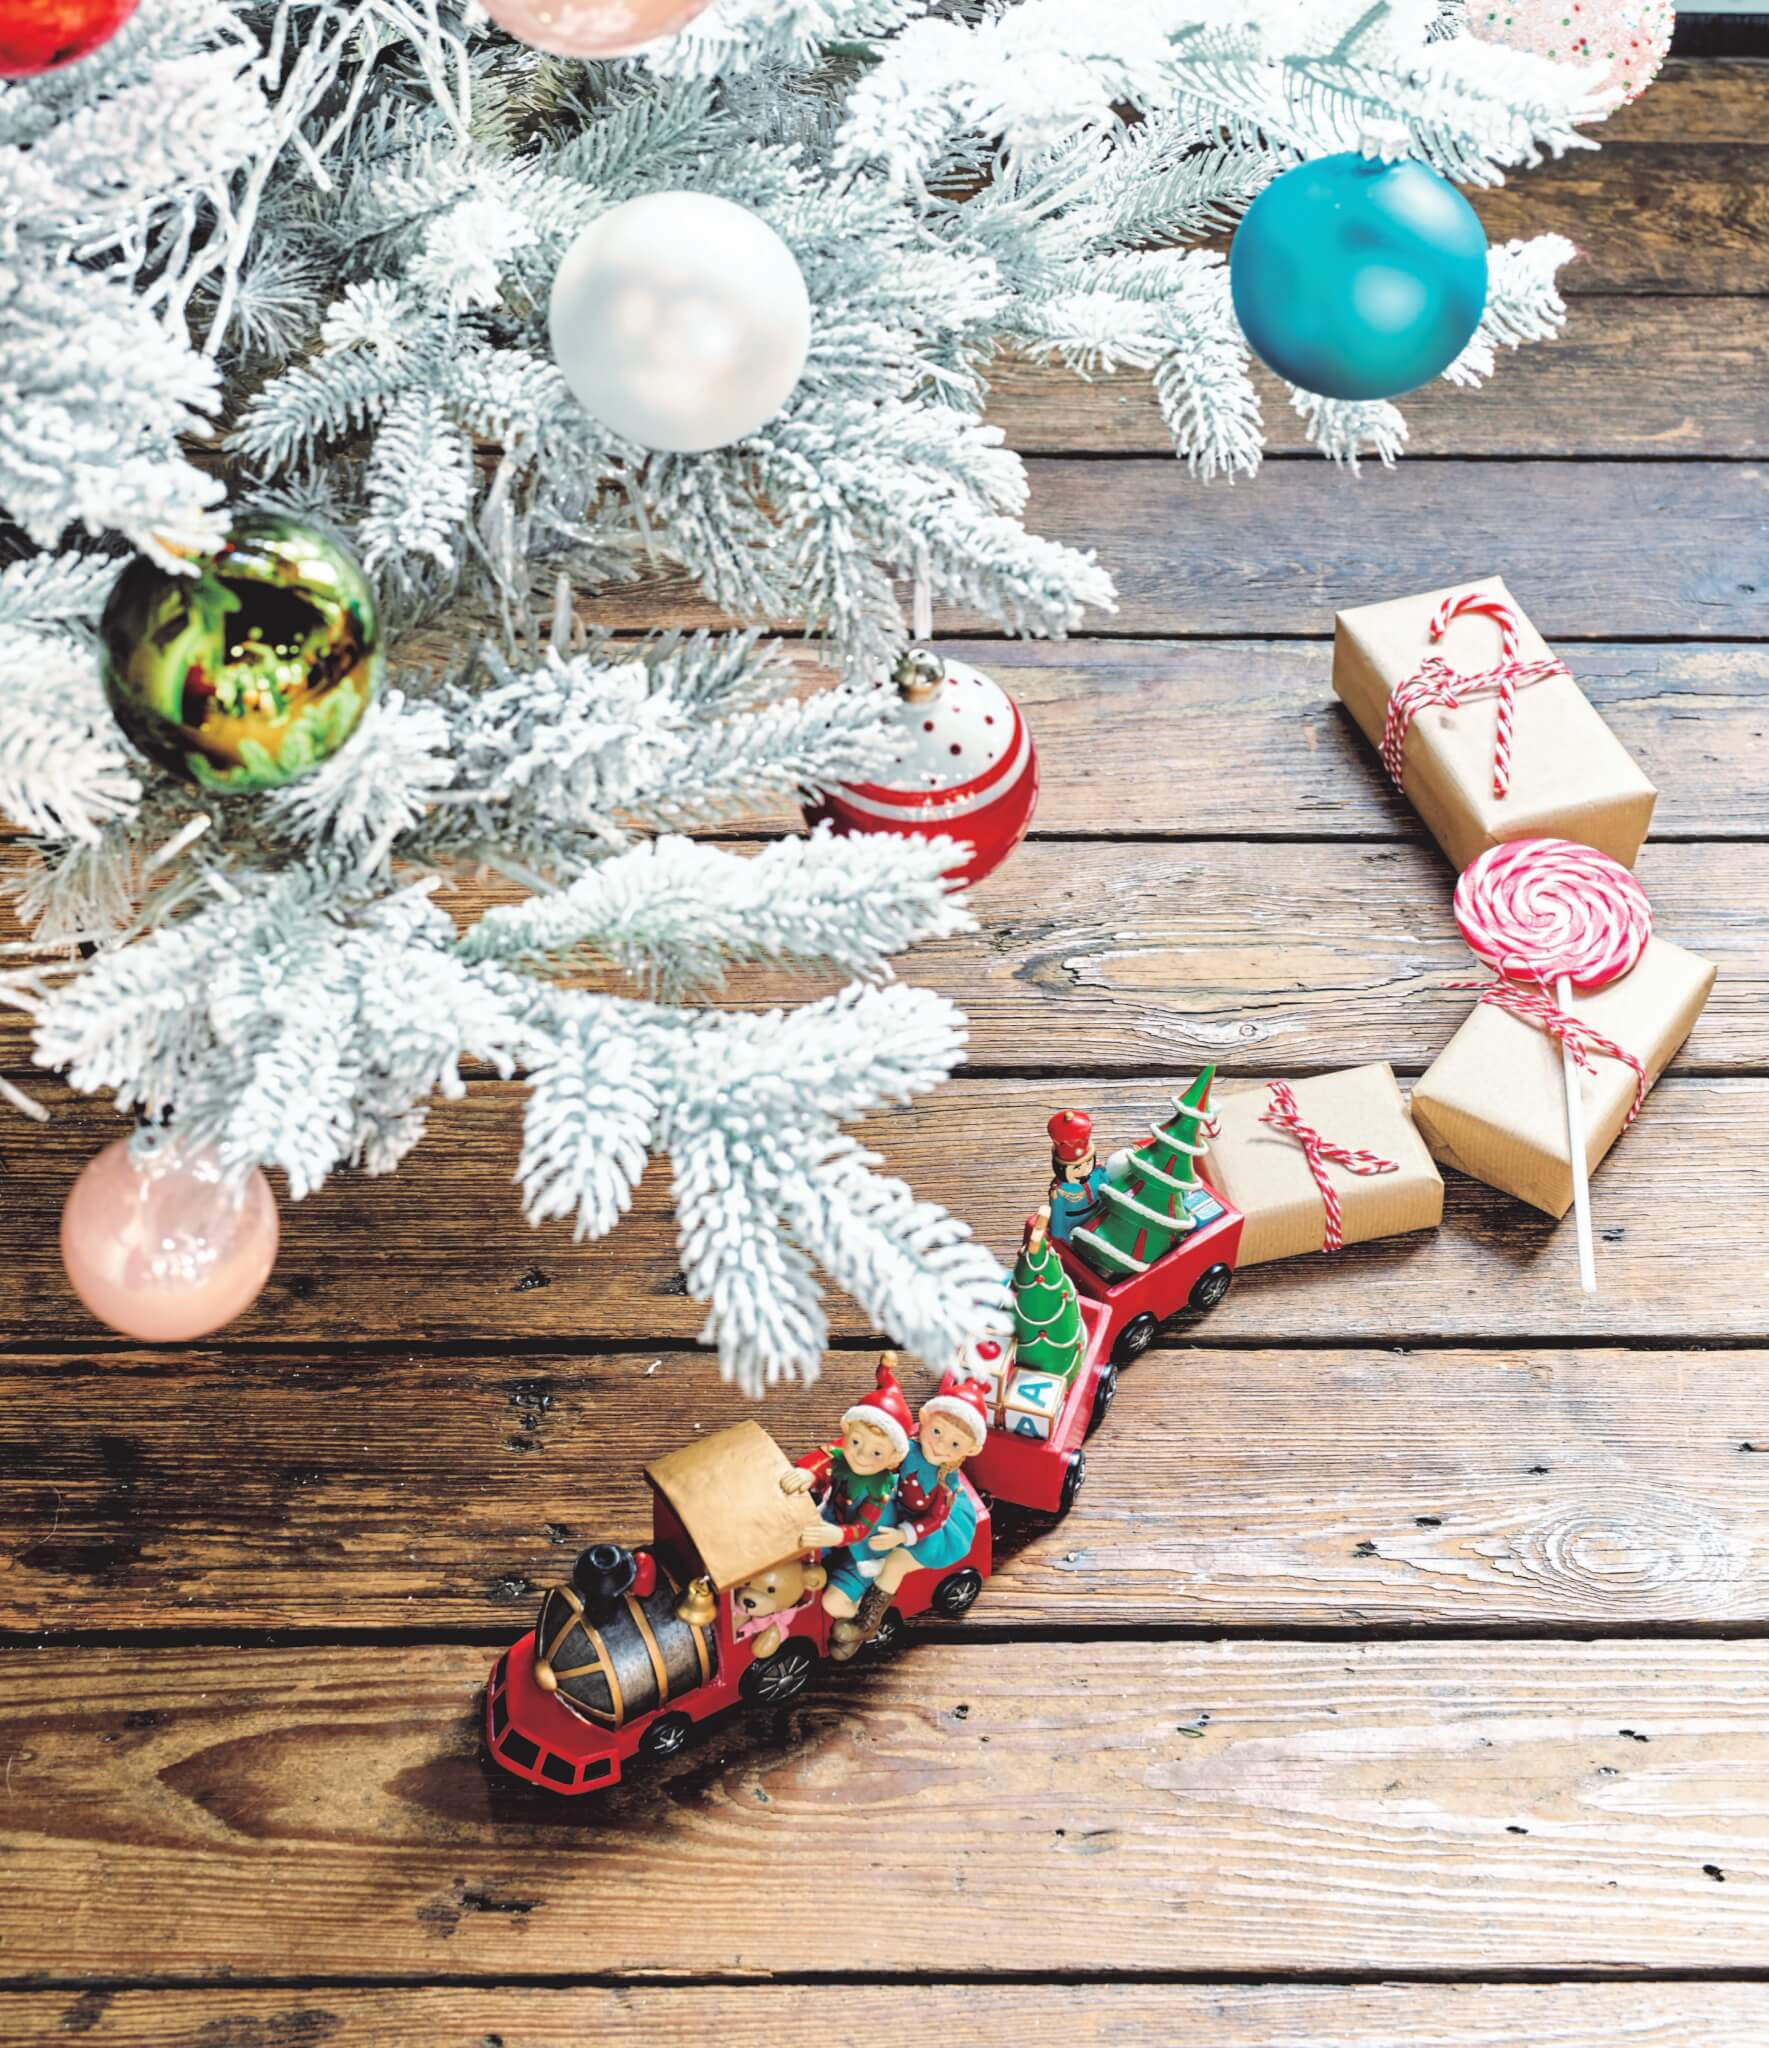 Kerstdecoratie | December to remember (2)